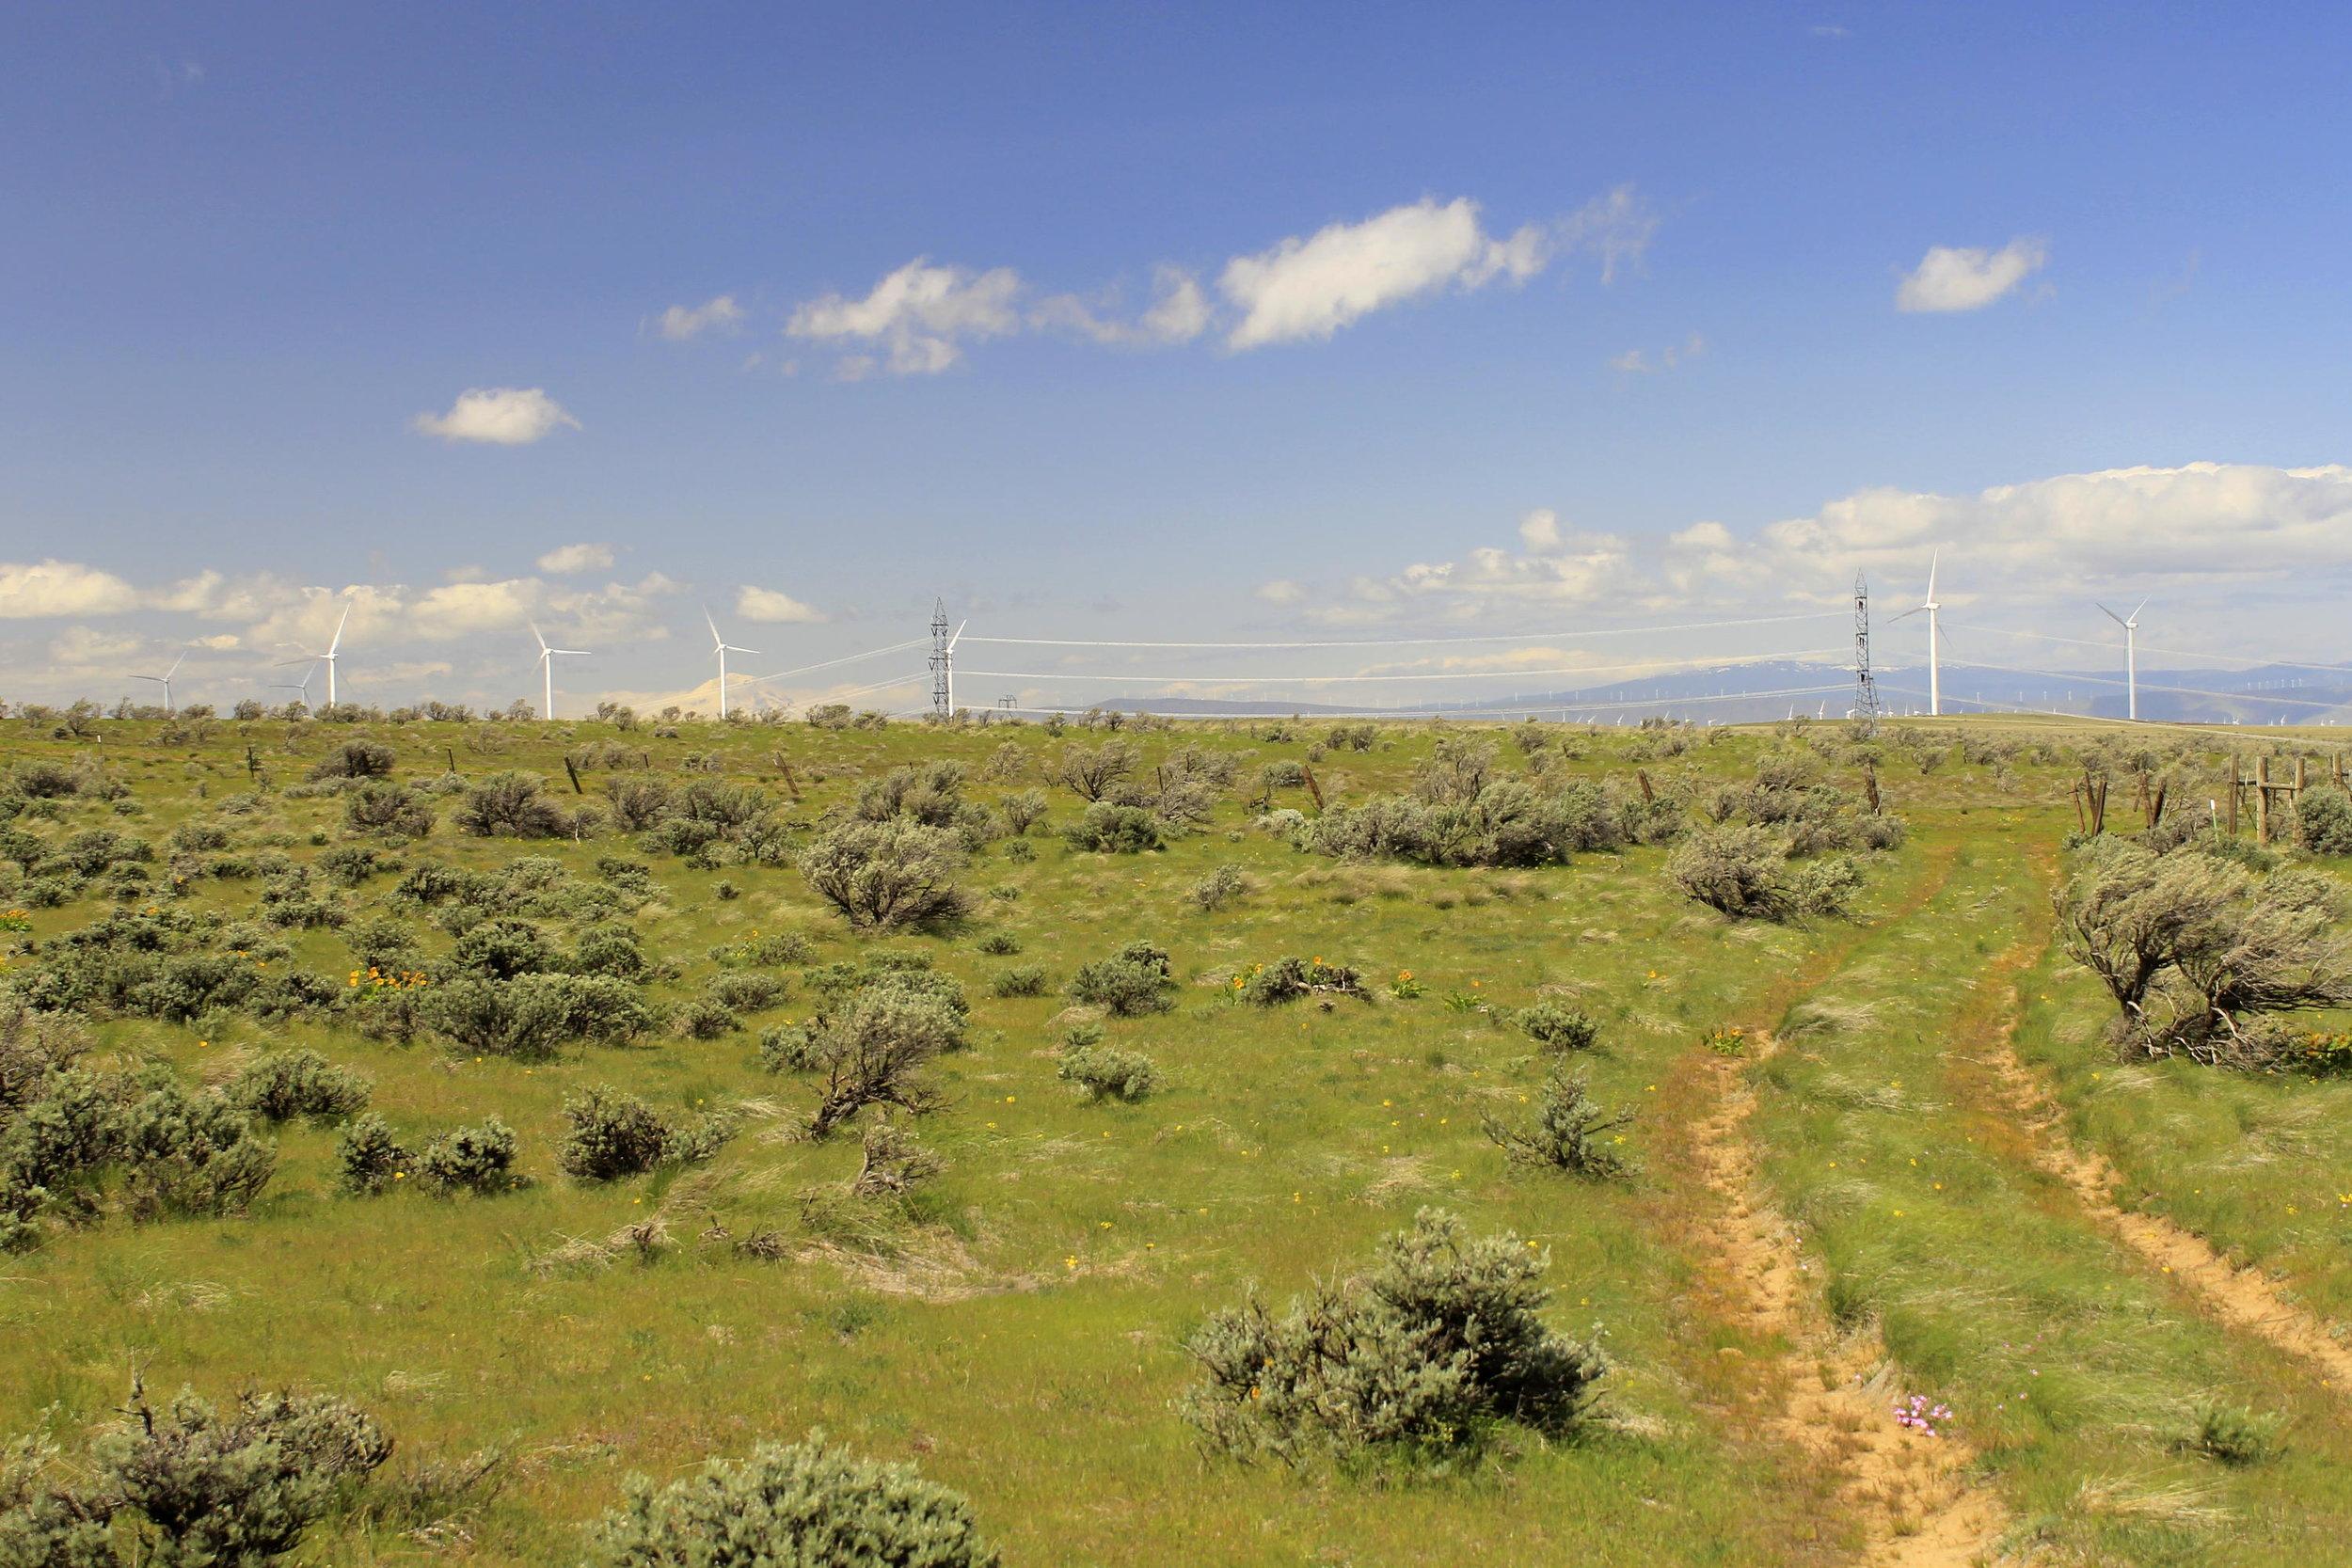 Mount Adams and wind turbines